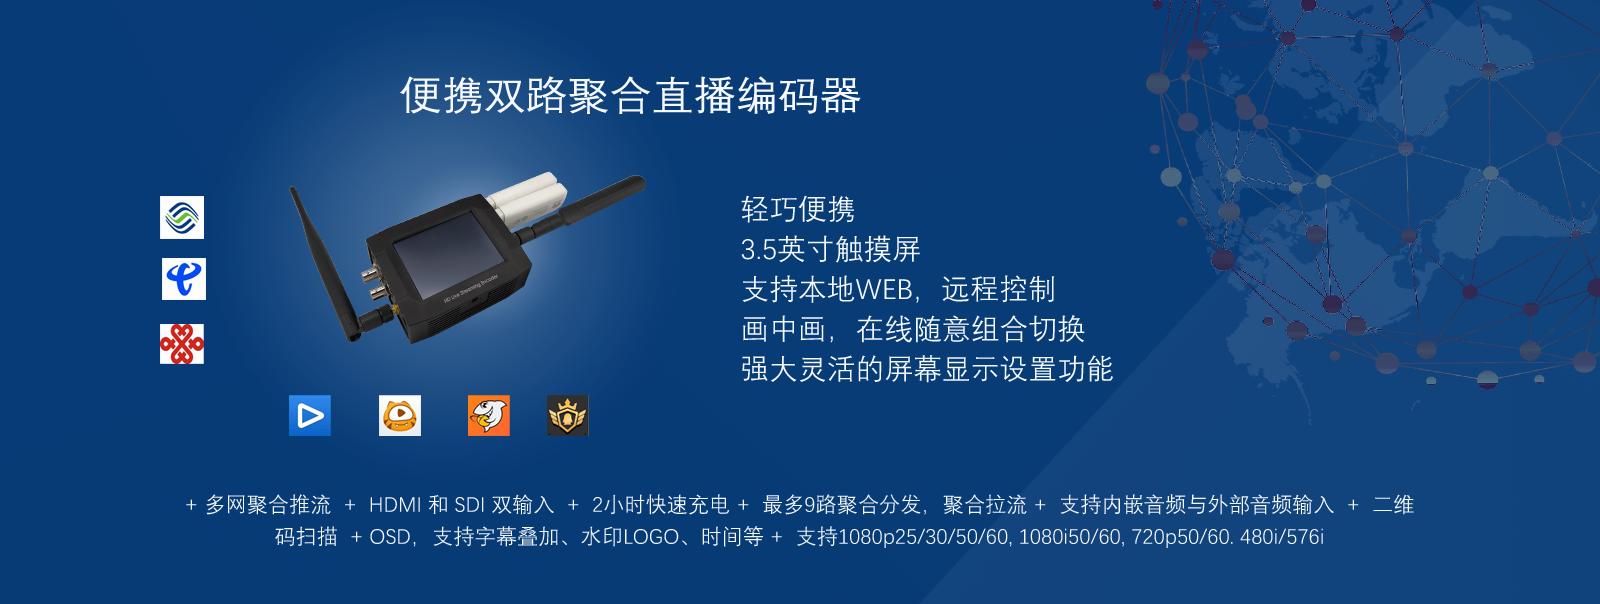 LiveV200编码器宣传图中文